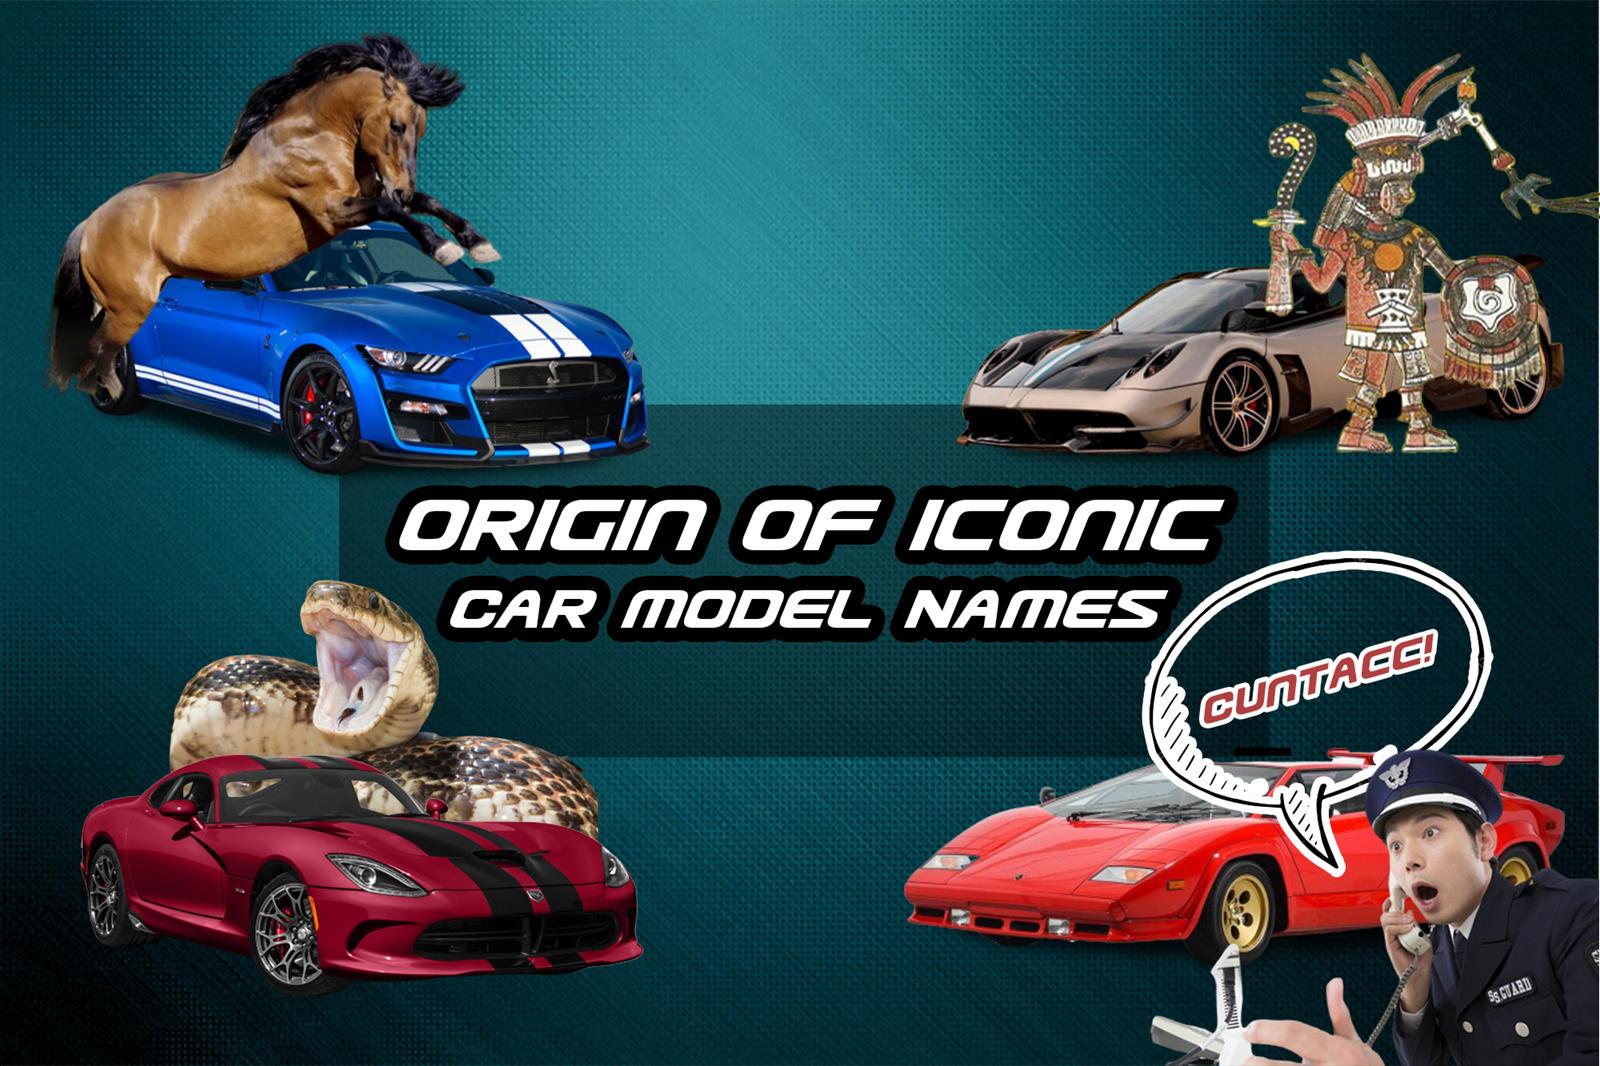 Origin Of 10 Iconic Car Model Names